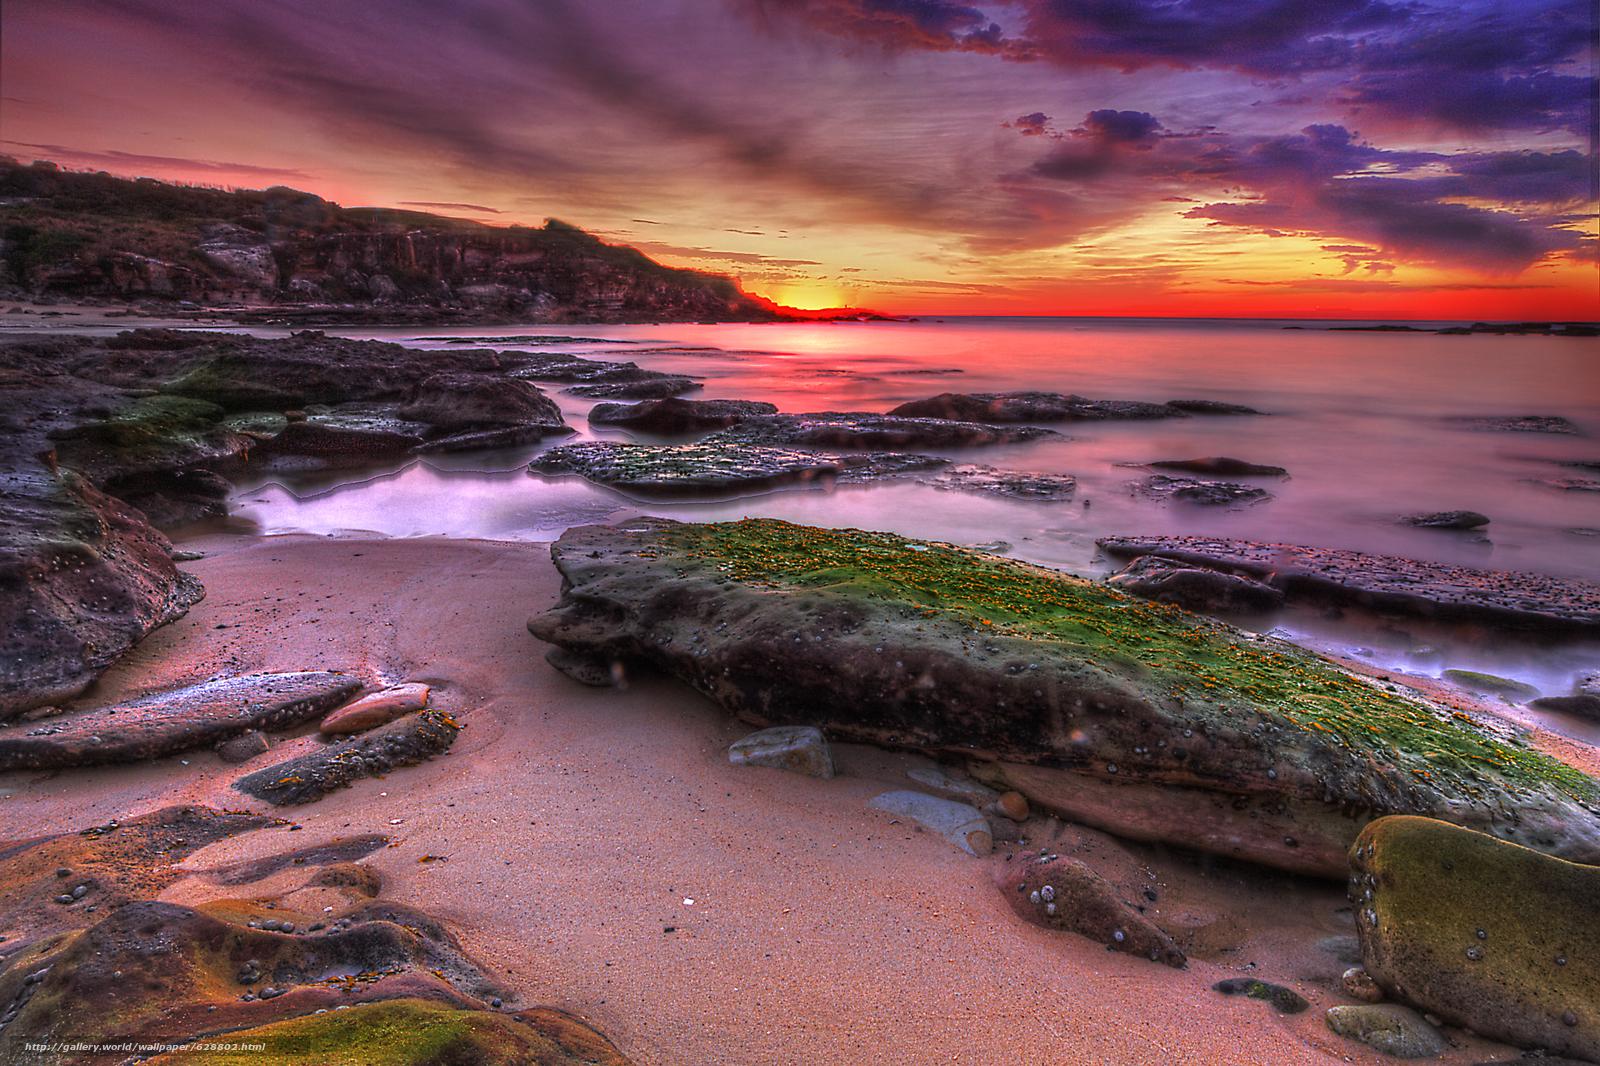 скалы, берег, море, пейзаж, закат